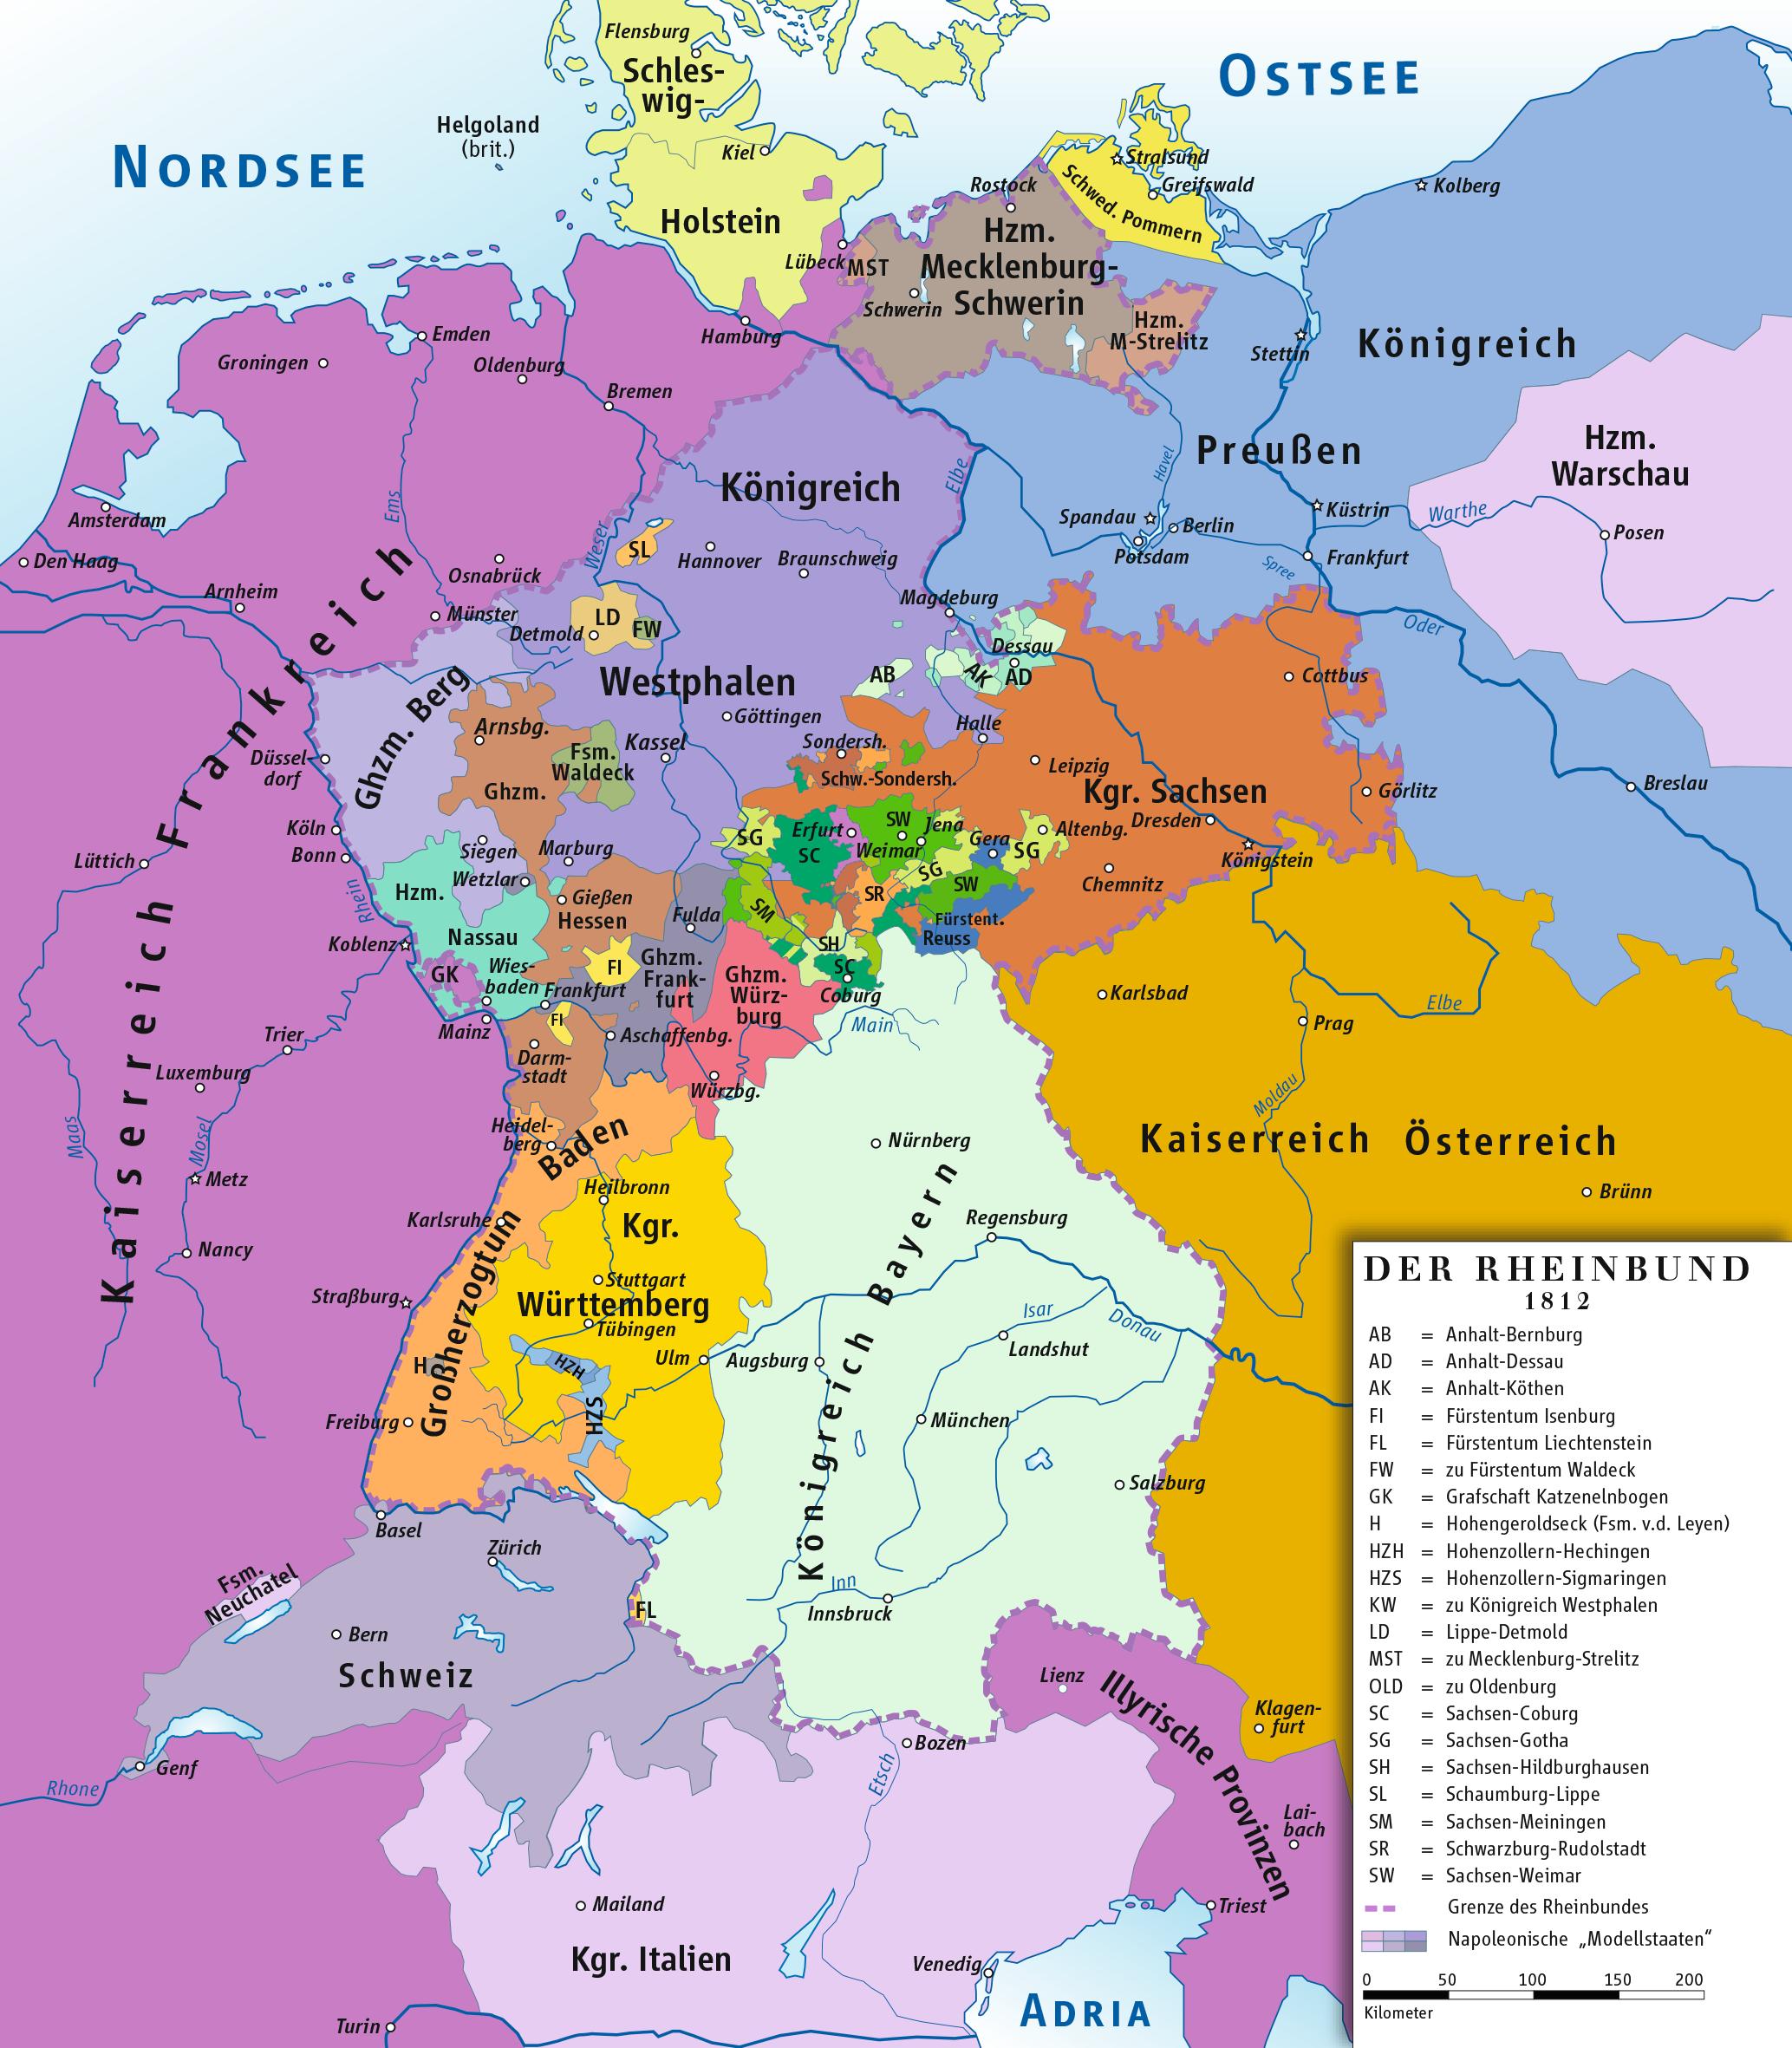 Atlas Of Germany Wikimedia Commons - Rhine valley germany map